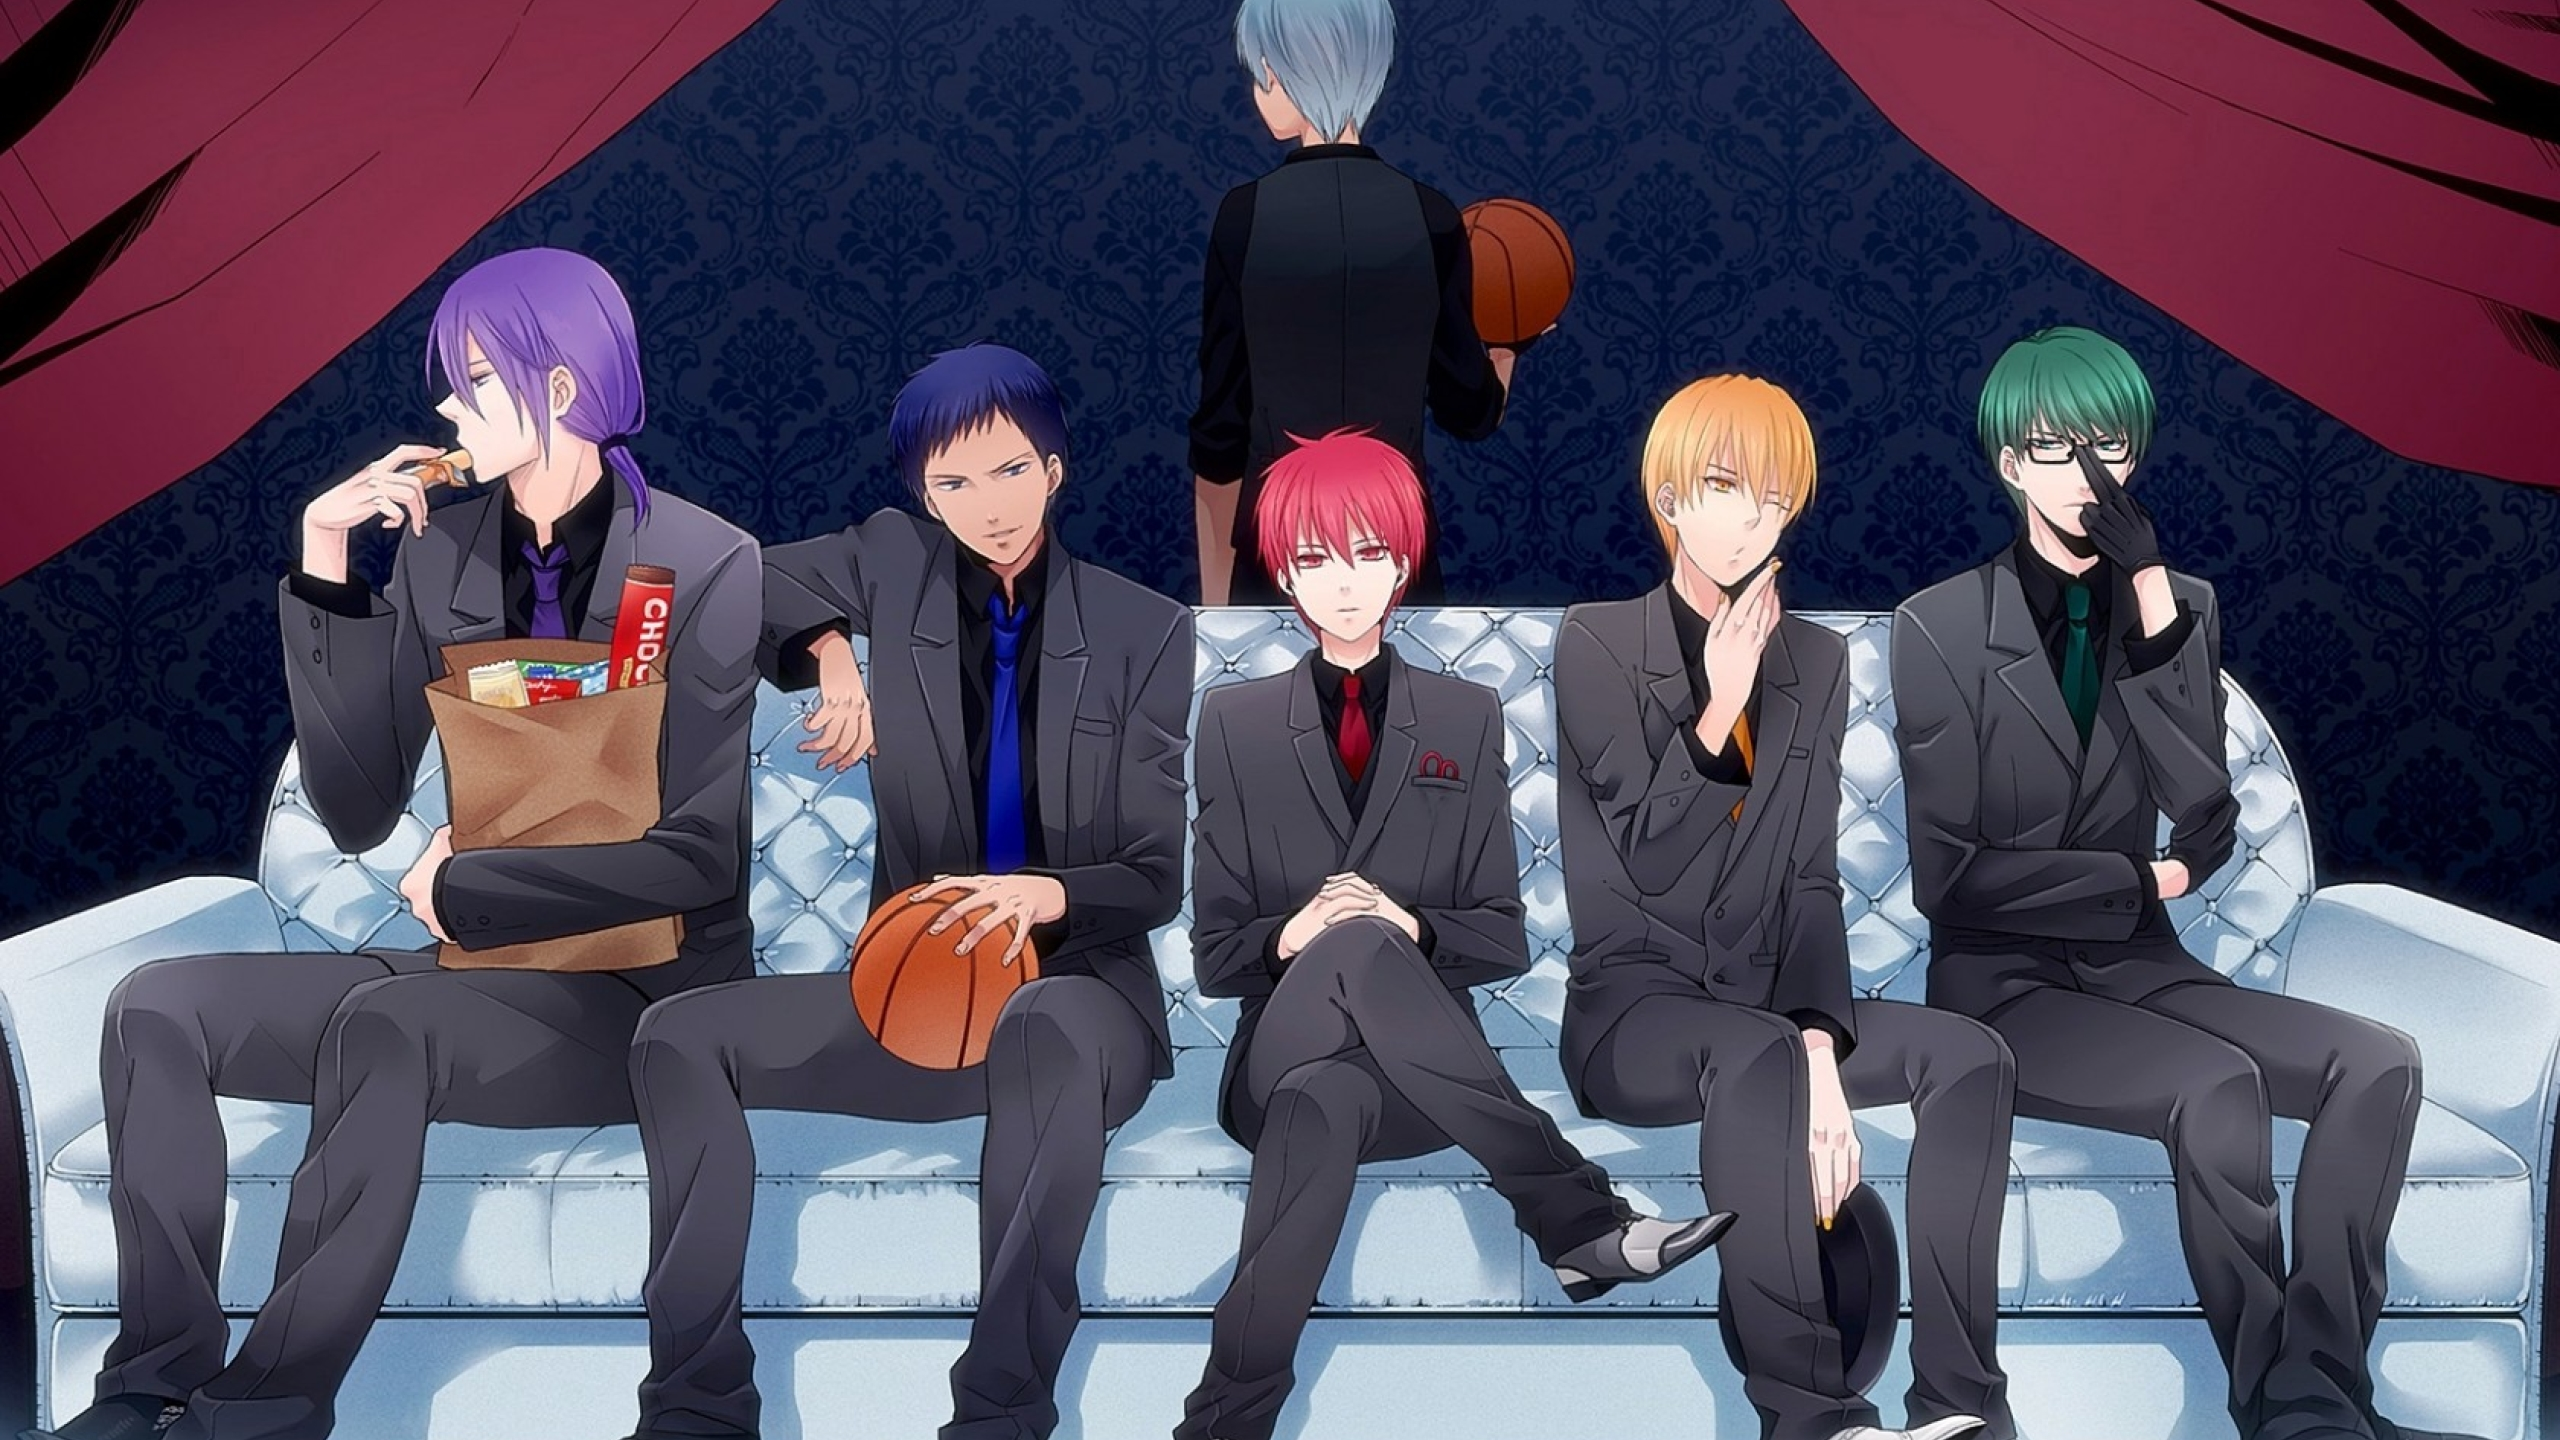 2560x1440 Kuroko No Basket Basketball Kuroko Akashi Seijuurou 1440p Resolution Wallpaper Hd Anime 4k Wallpapers Images Photos And Background